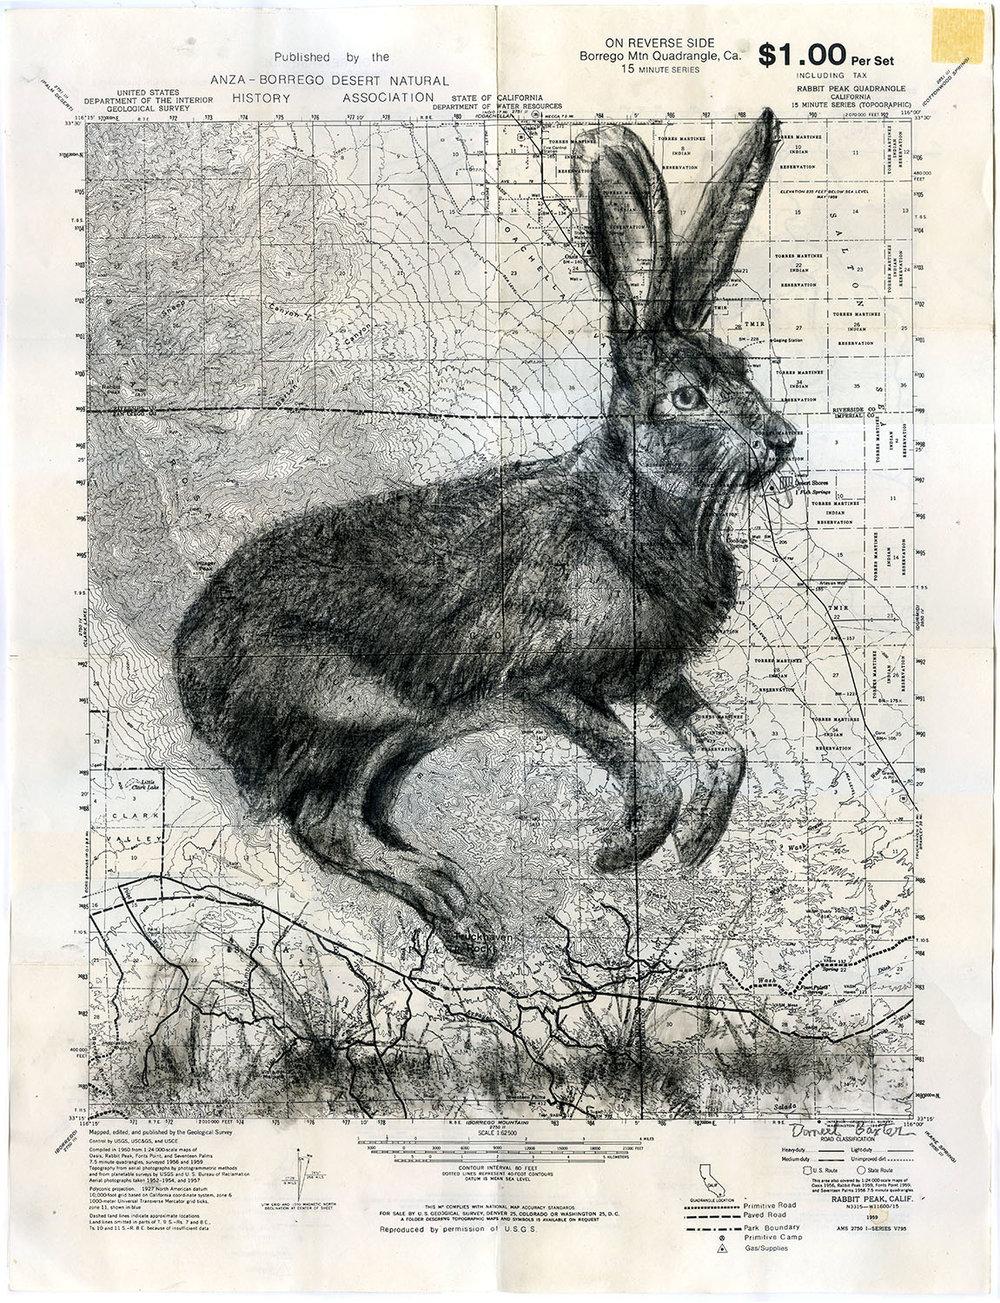 Daniel Baxter Jack Rabbit - Rabbit Peak art.jpg